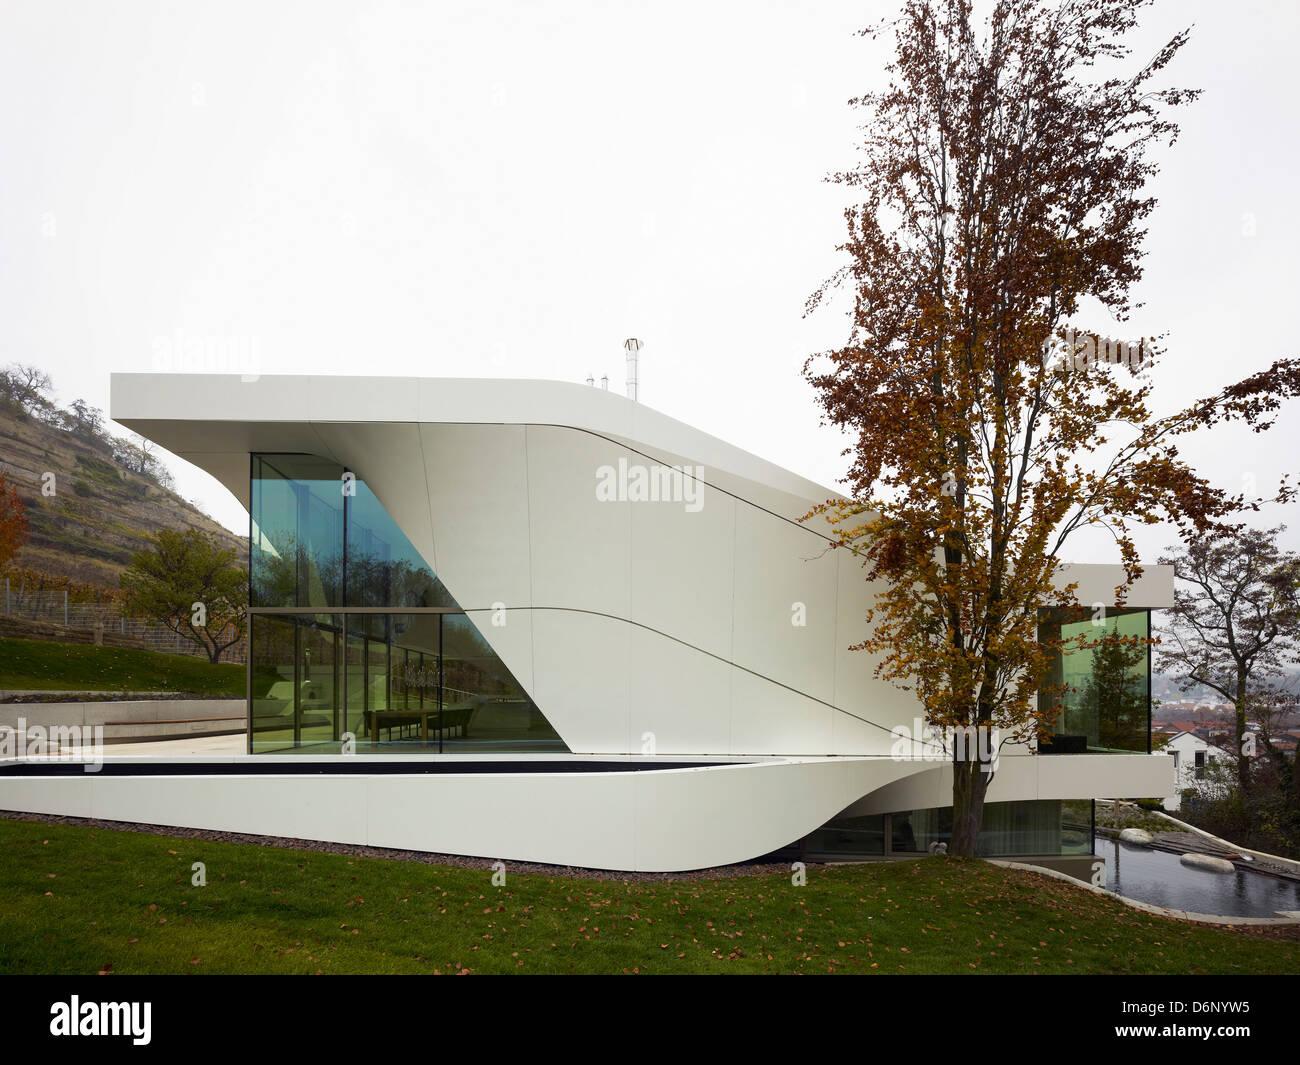 Haus Am Weinberg Stuttgart Germany Stockfotos & Haus Am